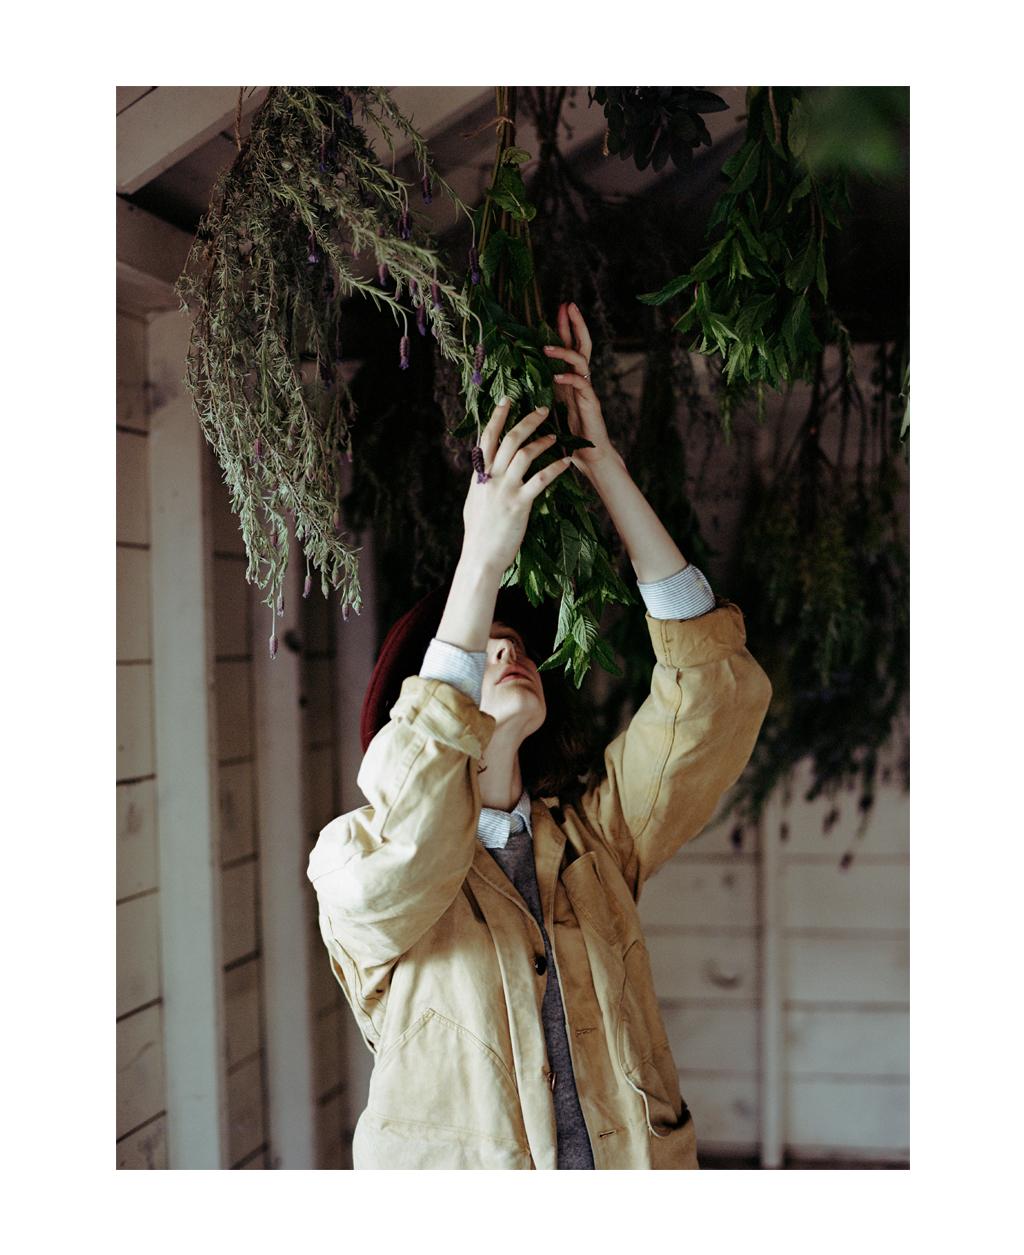 Skye, Herb Harvest, Kinfolk.